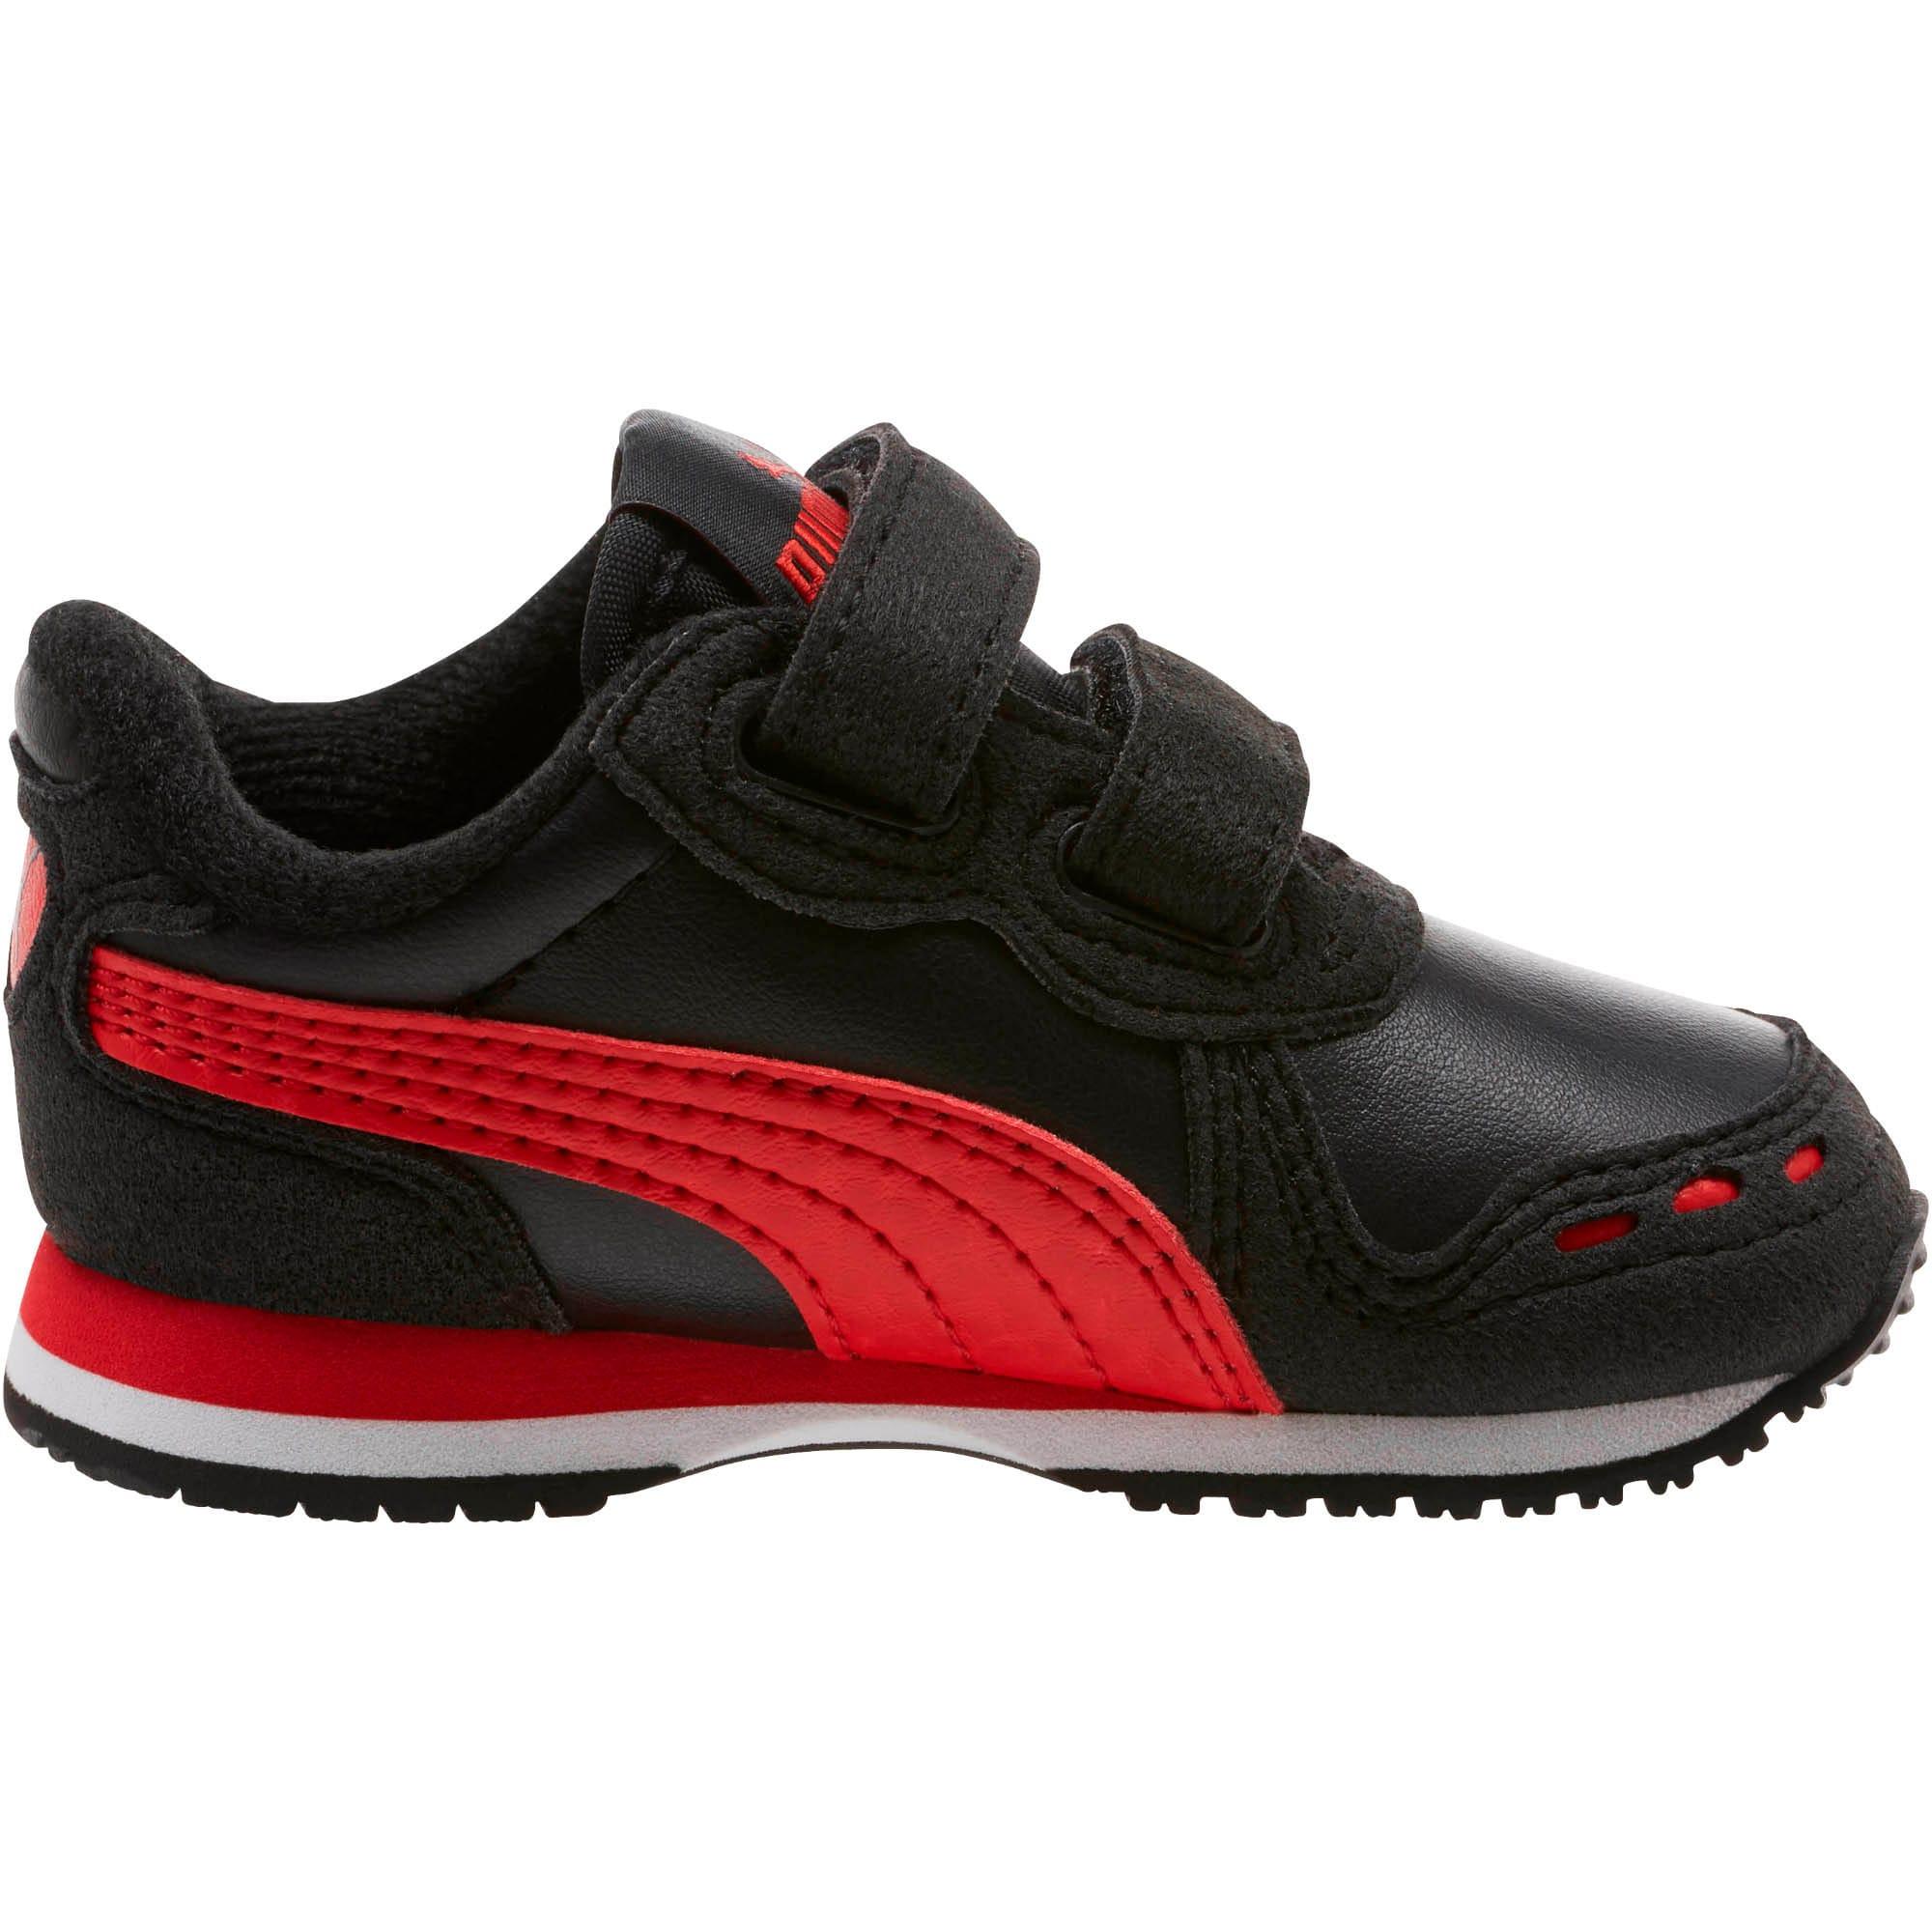 Thumbnail 4 of Cabana Racer SL Toddler Shoes, Puma Black-High Risk Red, medium